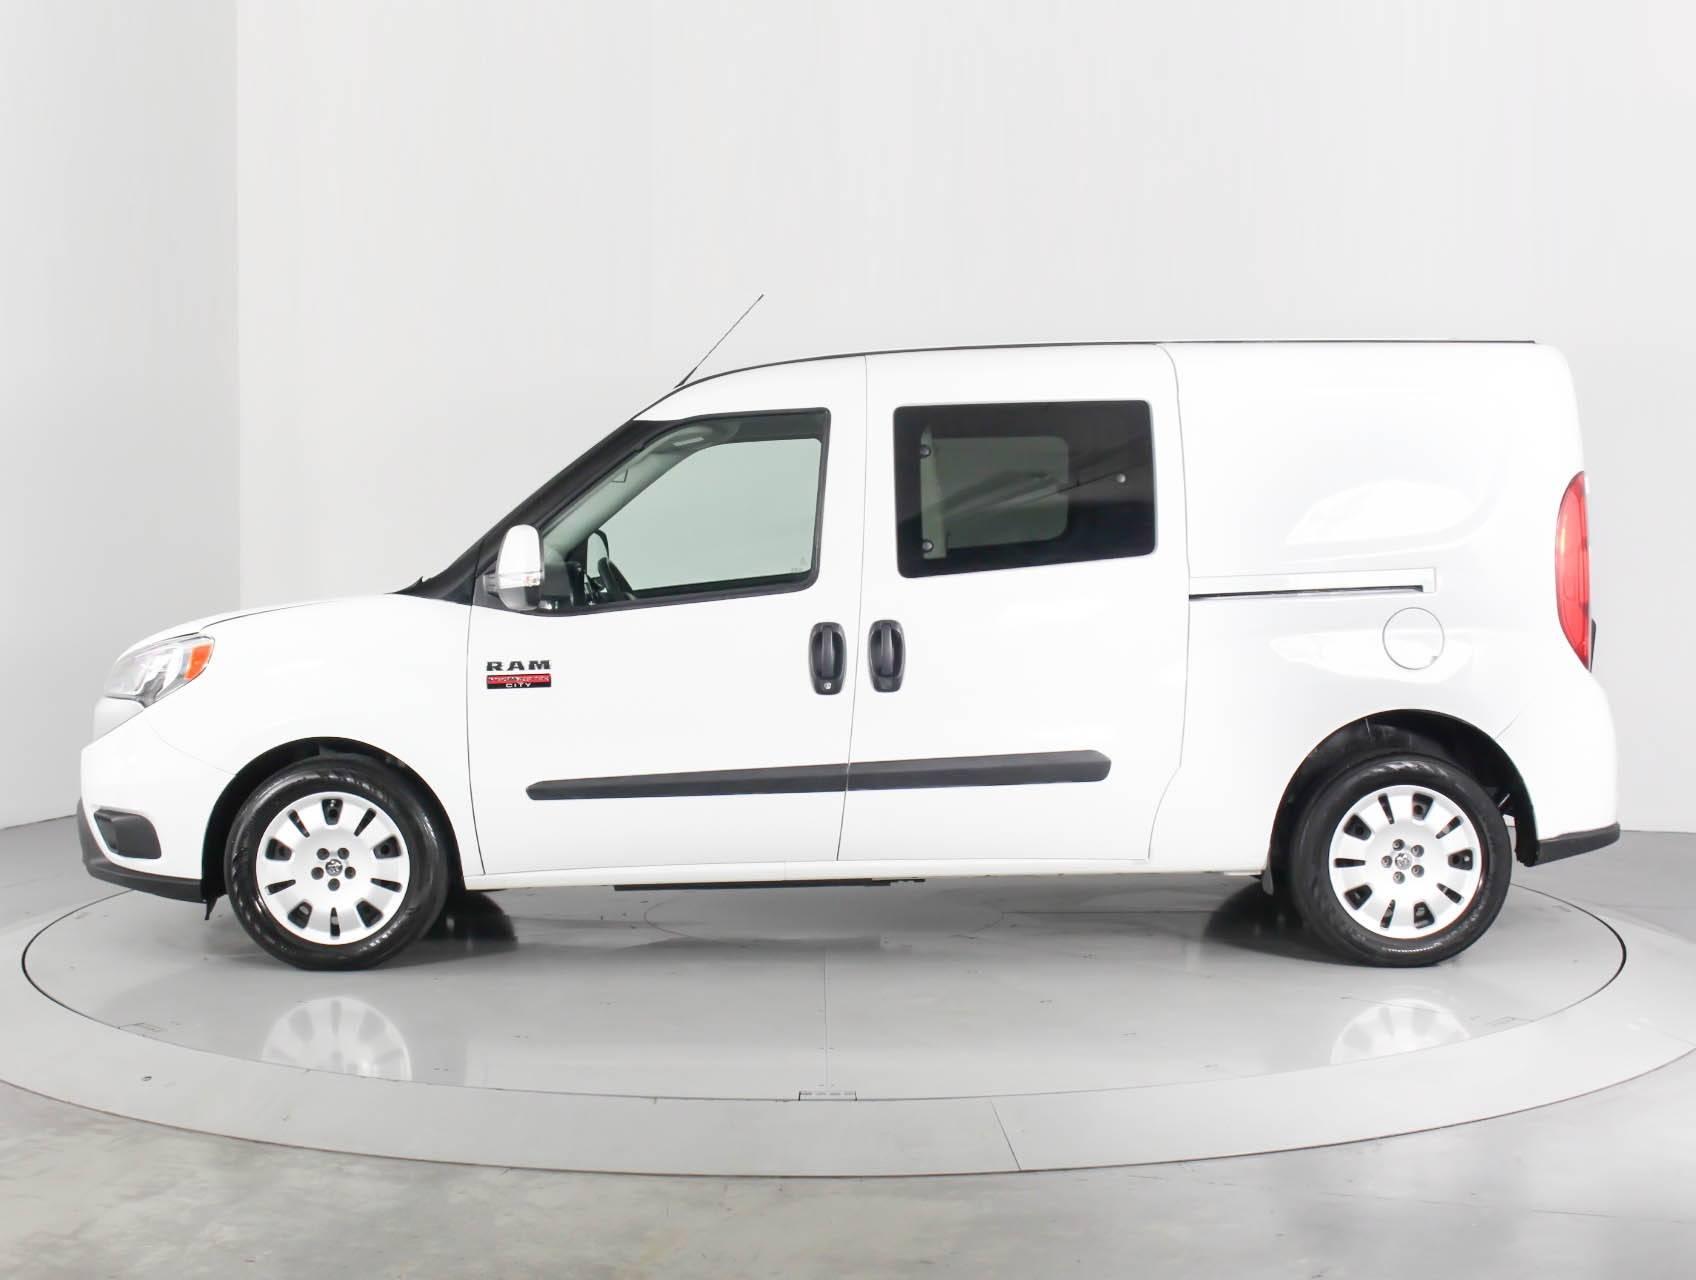 5da22f4b97 Used 2016 RAM PROMASTER CITY SLT Cargo Van for sale in WEST PALM